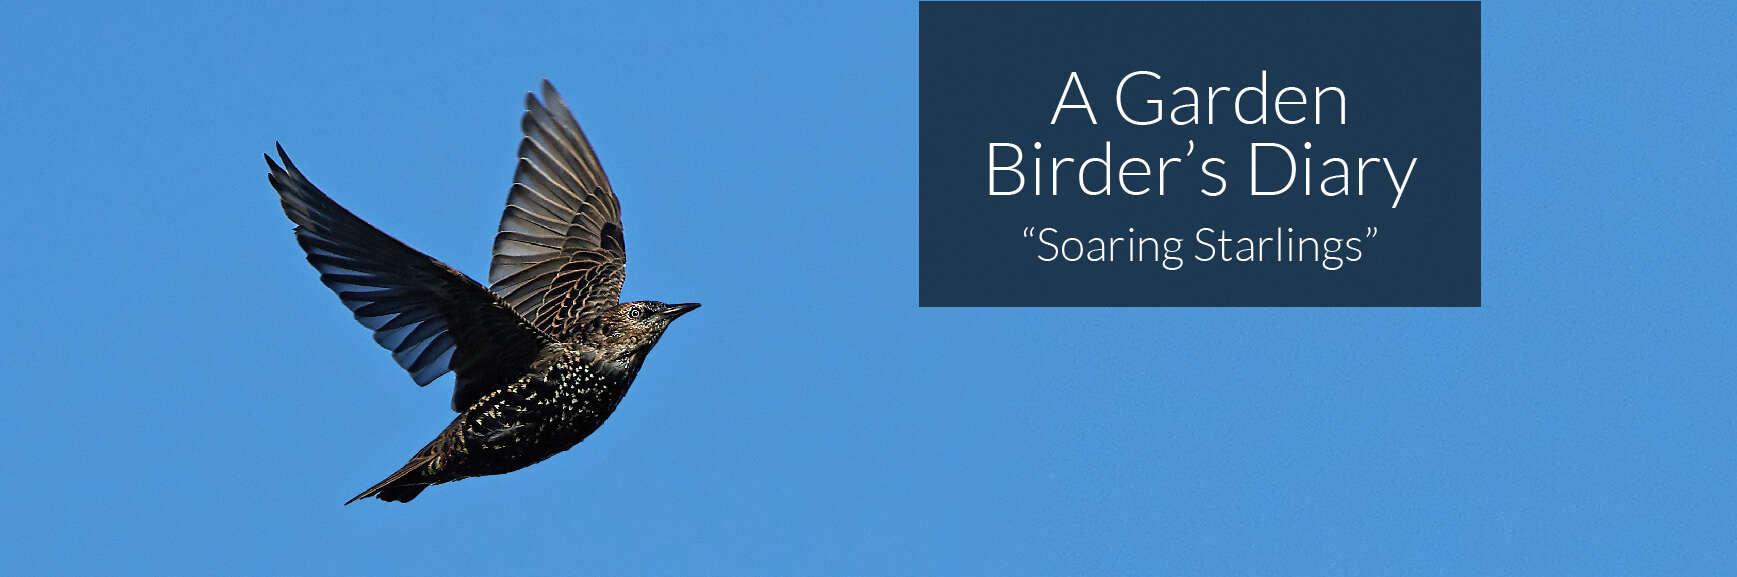 A Garden Birder's Diary – Soaring Starlings